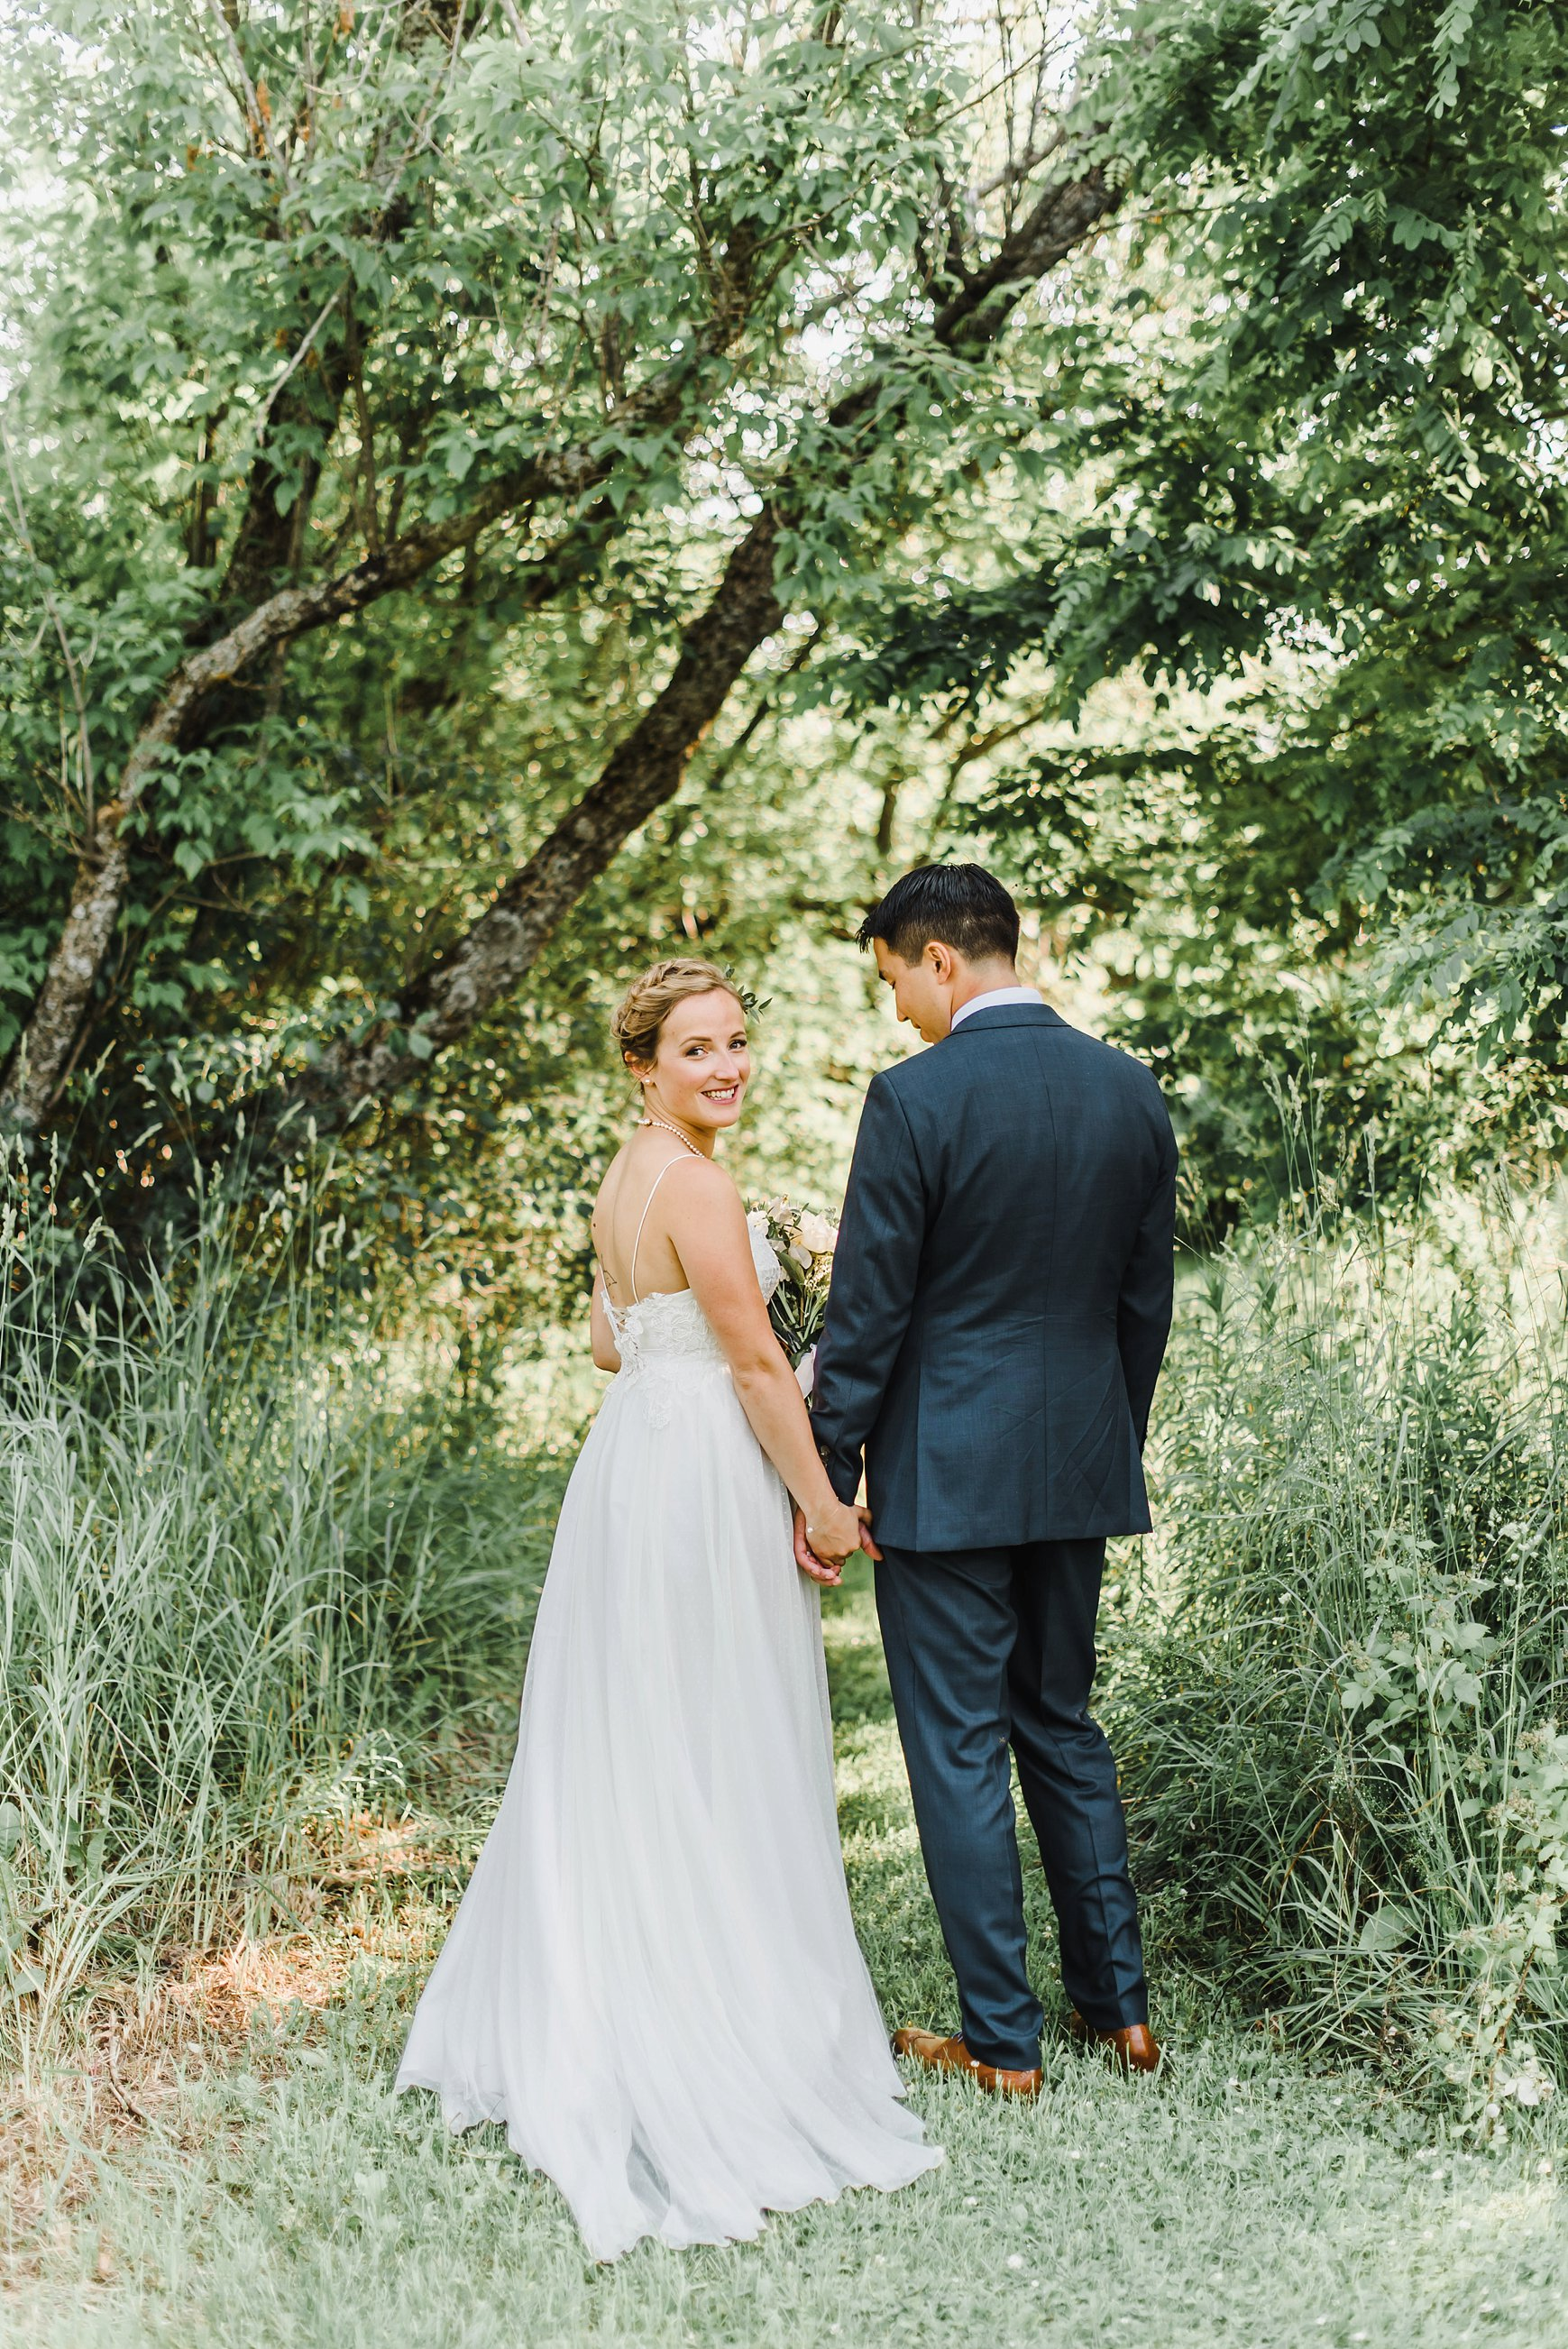 light airy indie fine art ottawa wedding photographer | Ali and Batoul Photography_0840.jpg